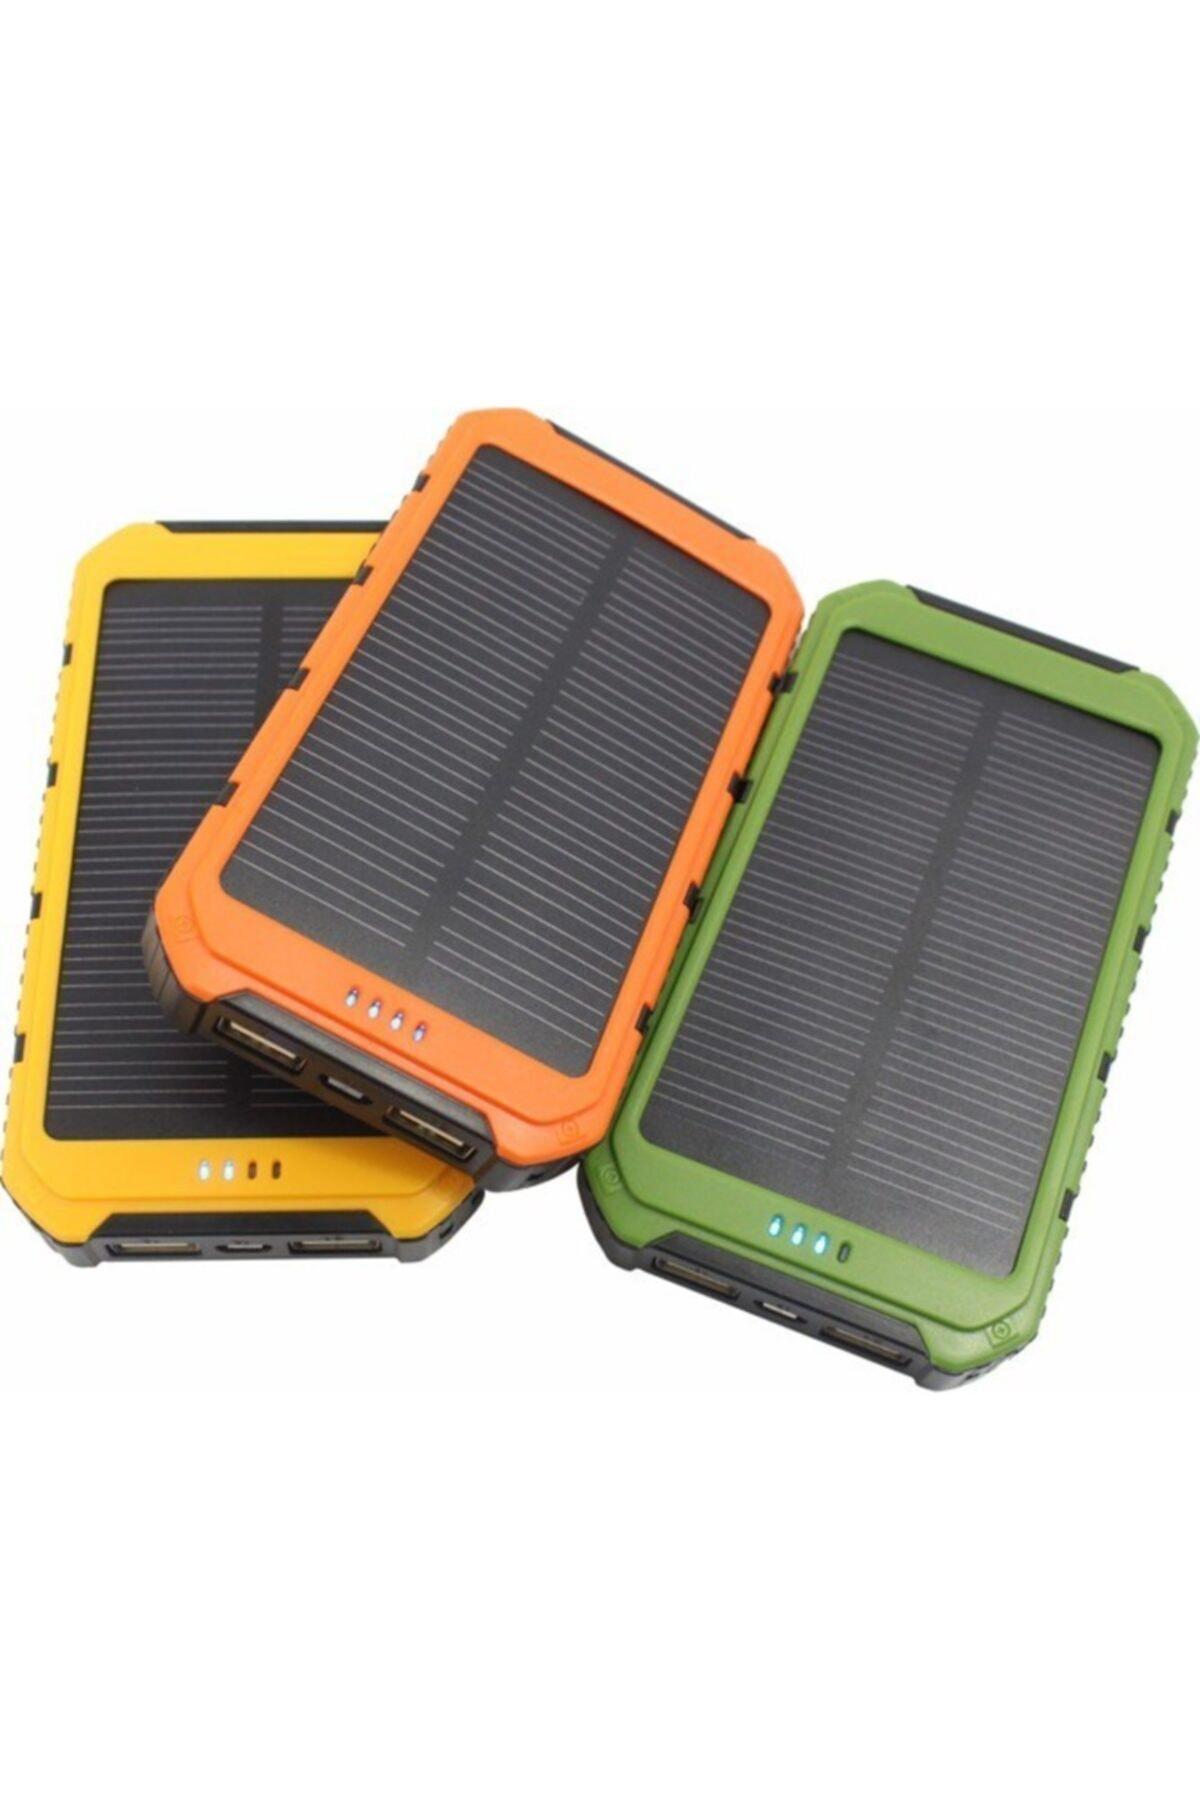 matchbang Solar Güneş Enerjili 15000 Mah Taşınabilir Şarj Cihazı - Powerbank